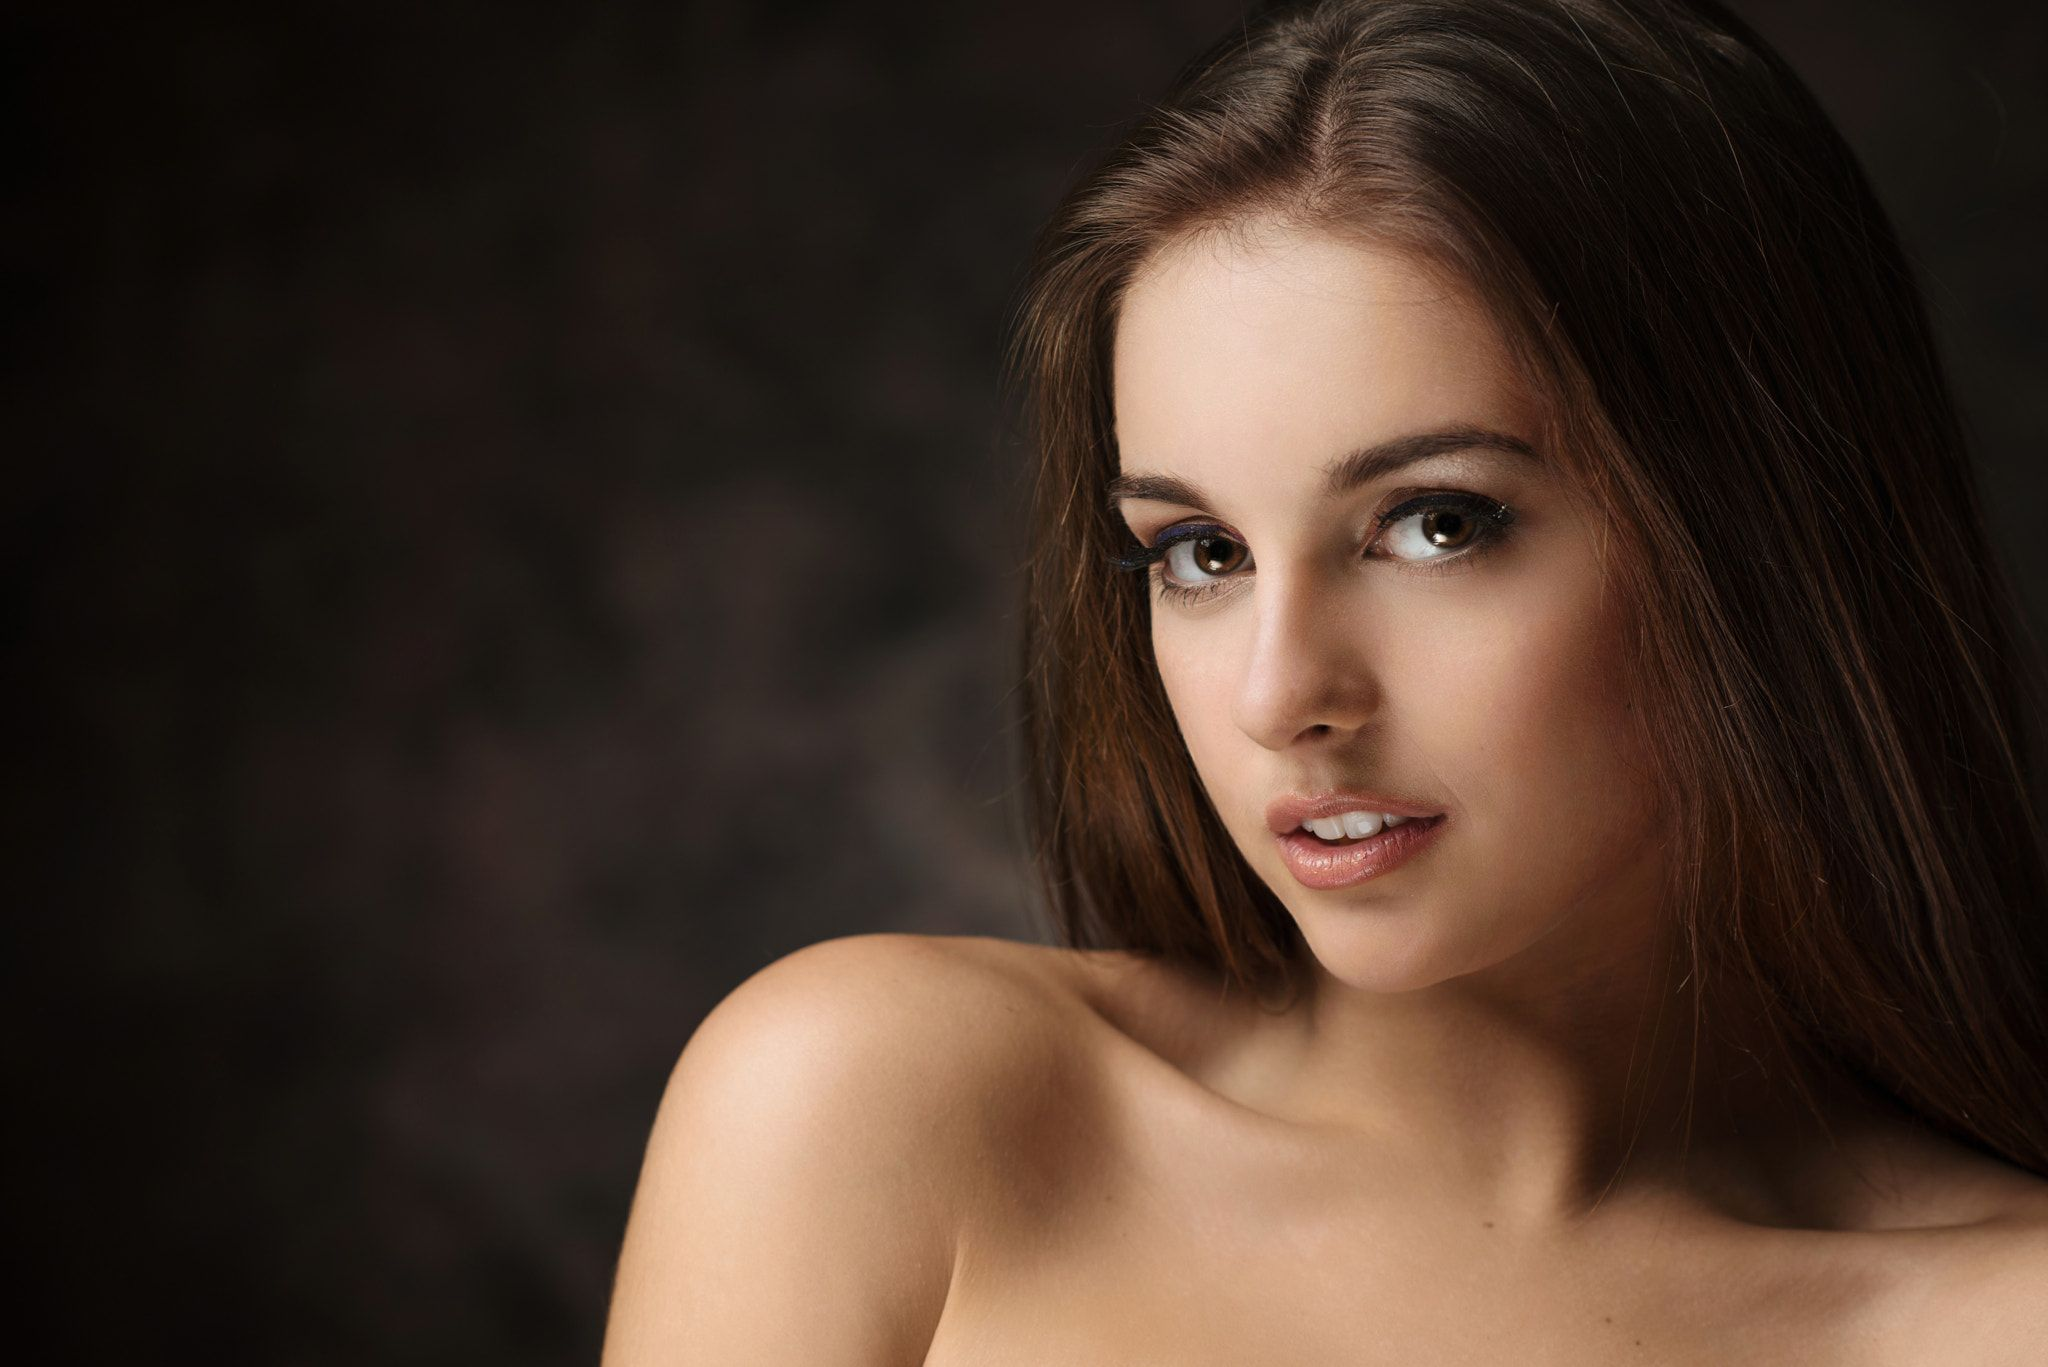 Portrait   model: Nastya Lokteva photo by: Maxim Maximov